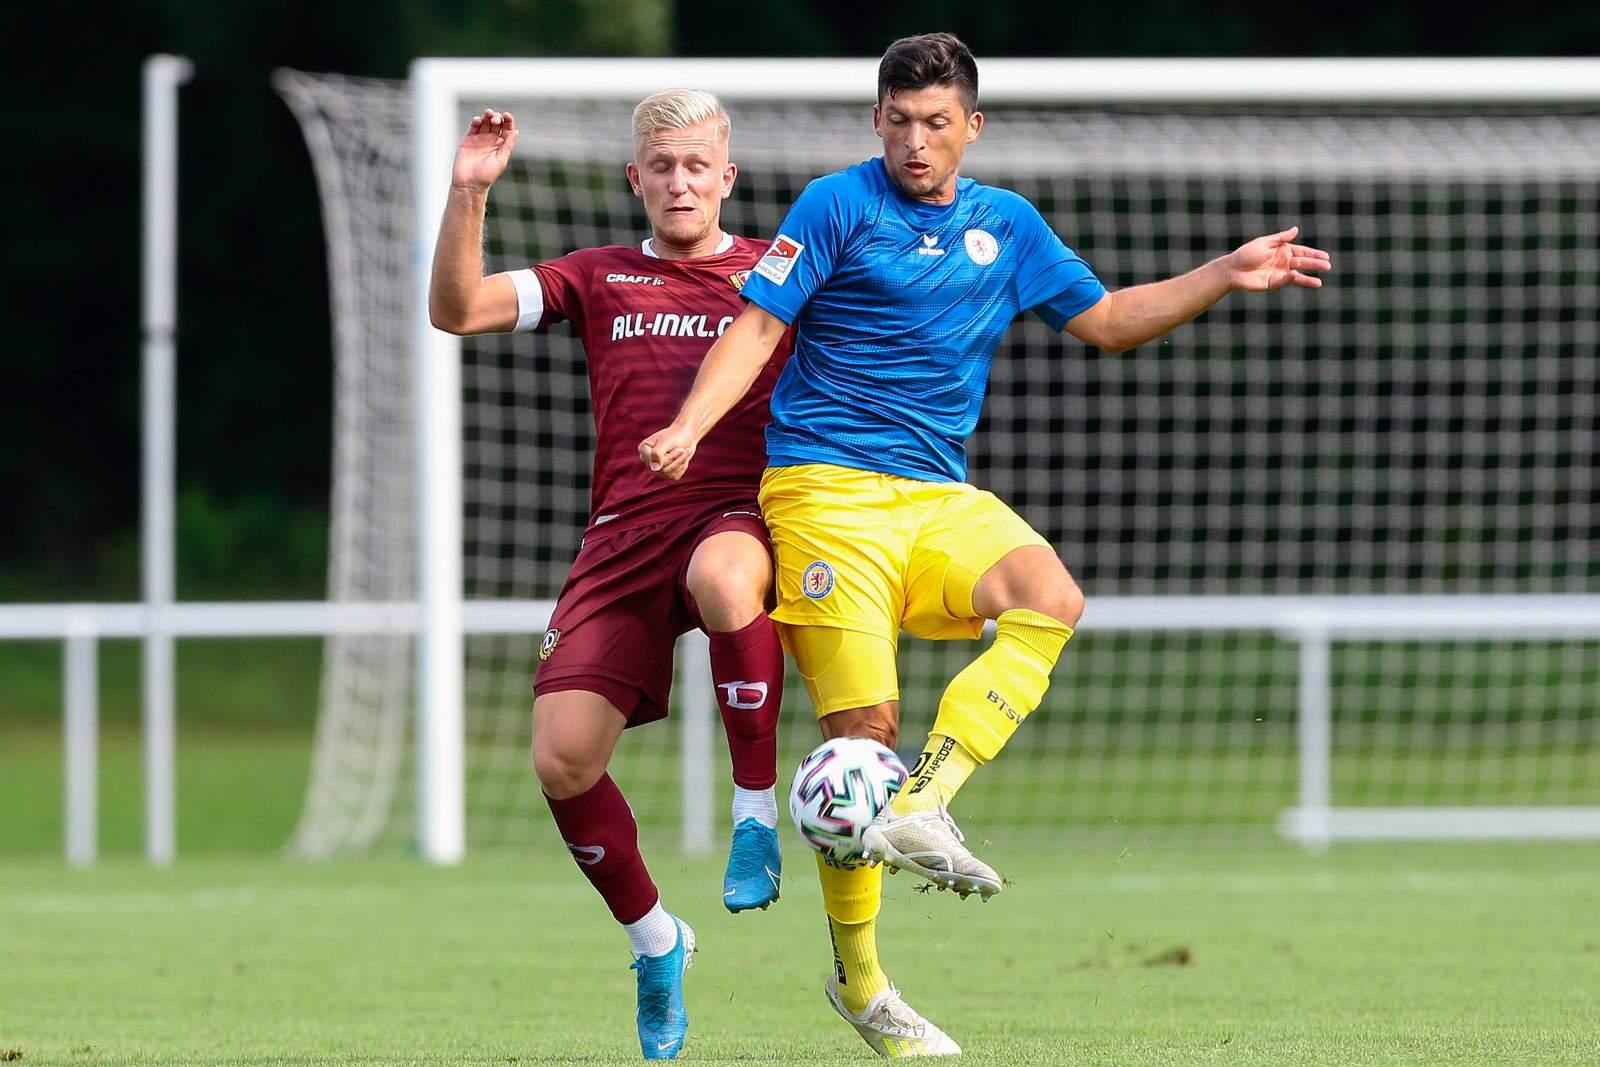 Jannis Nikolaou gewinnt Zweikampf gegen Luka Stor